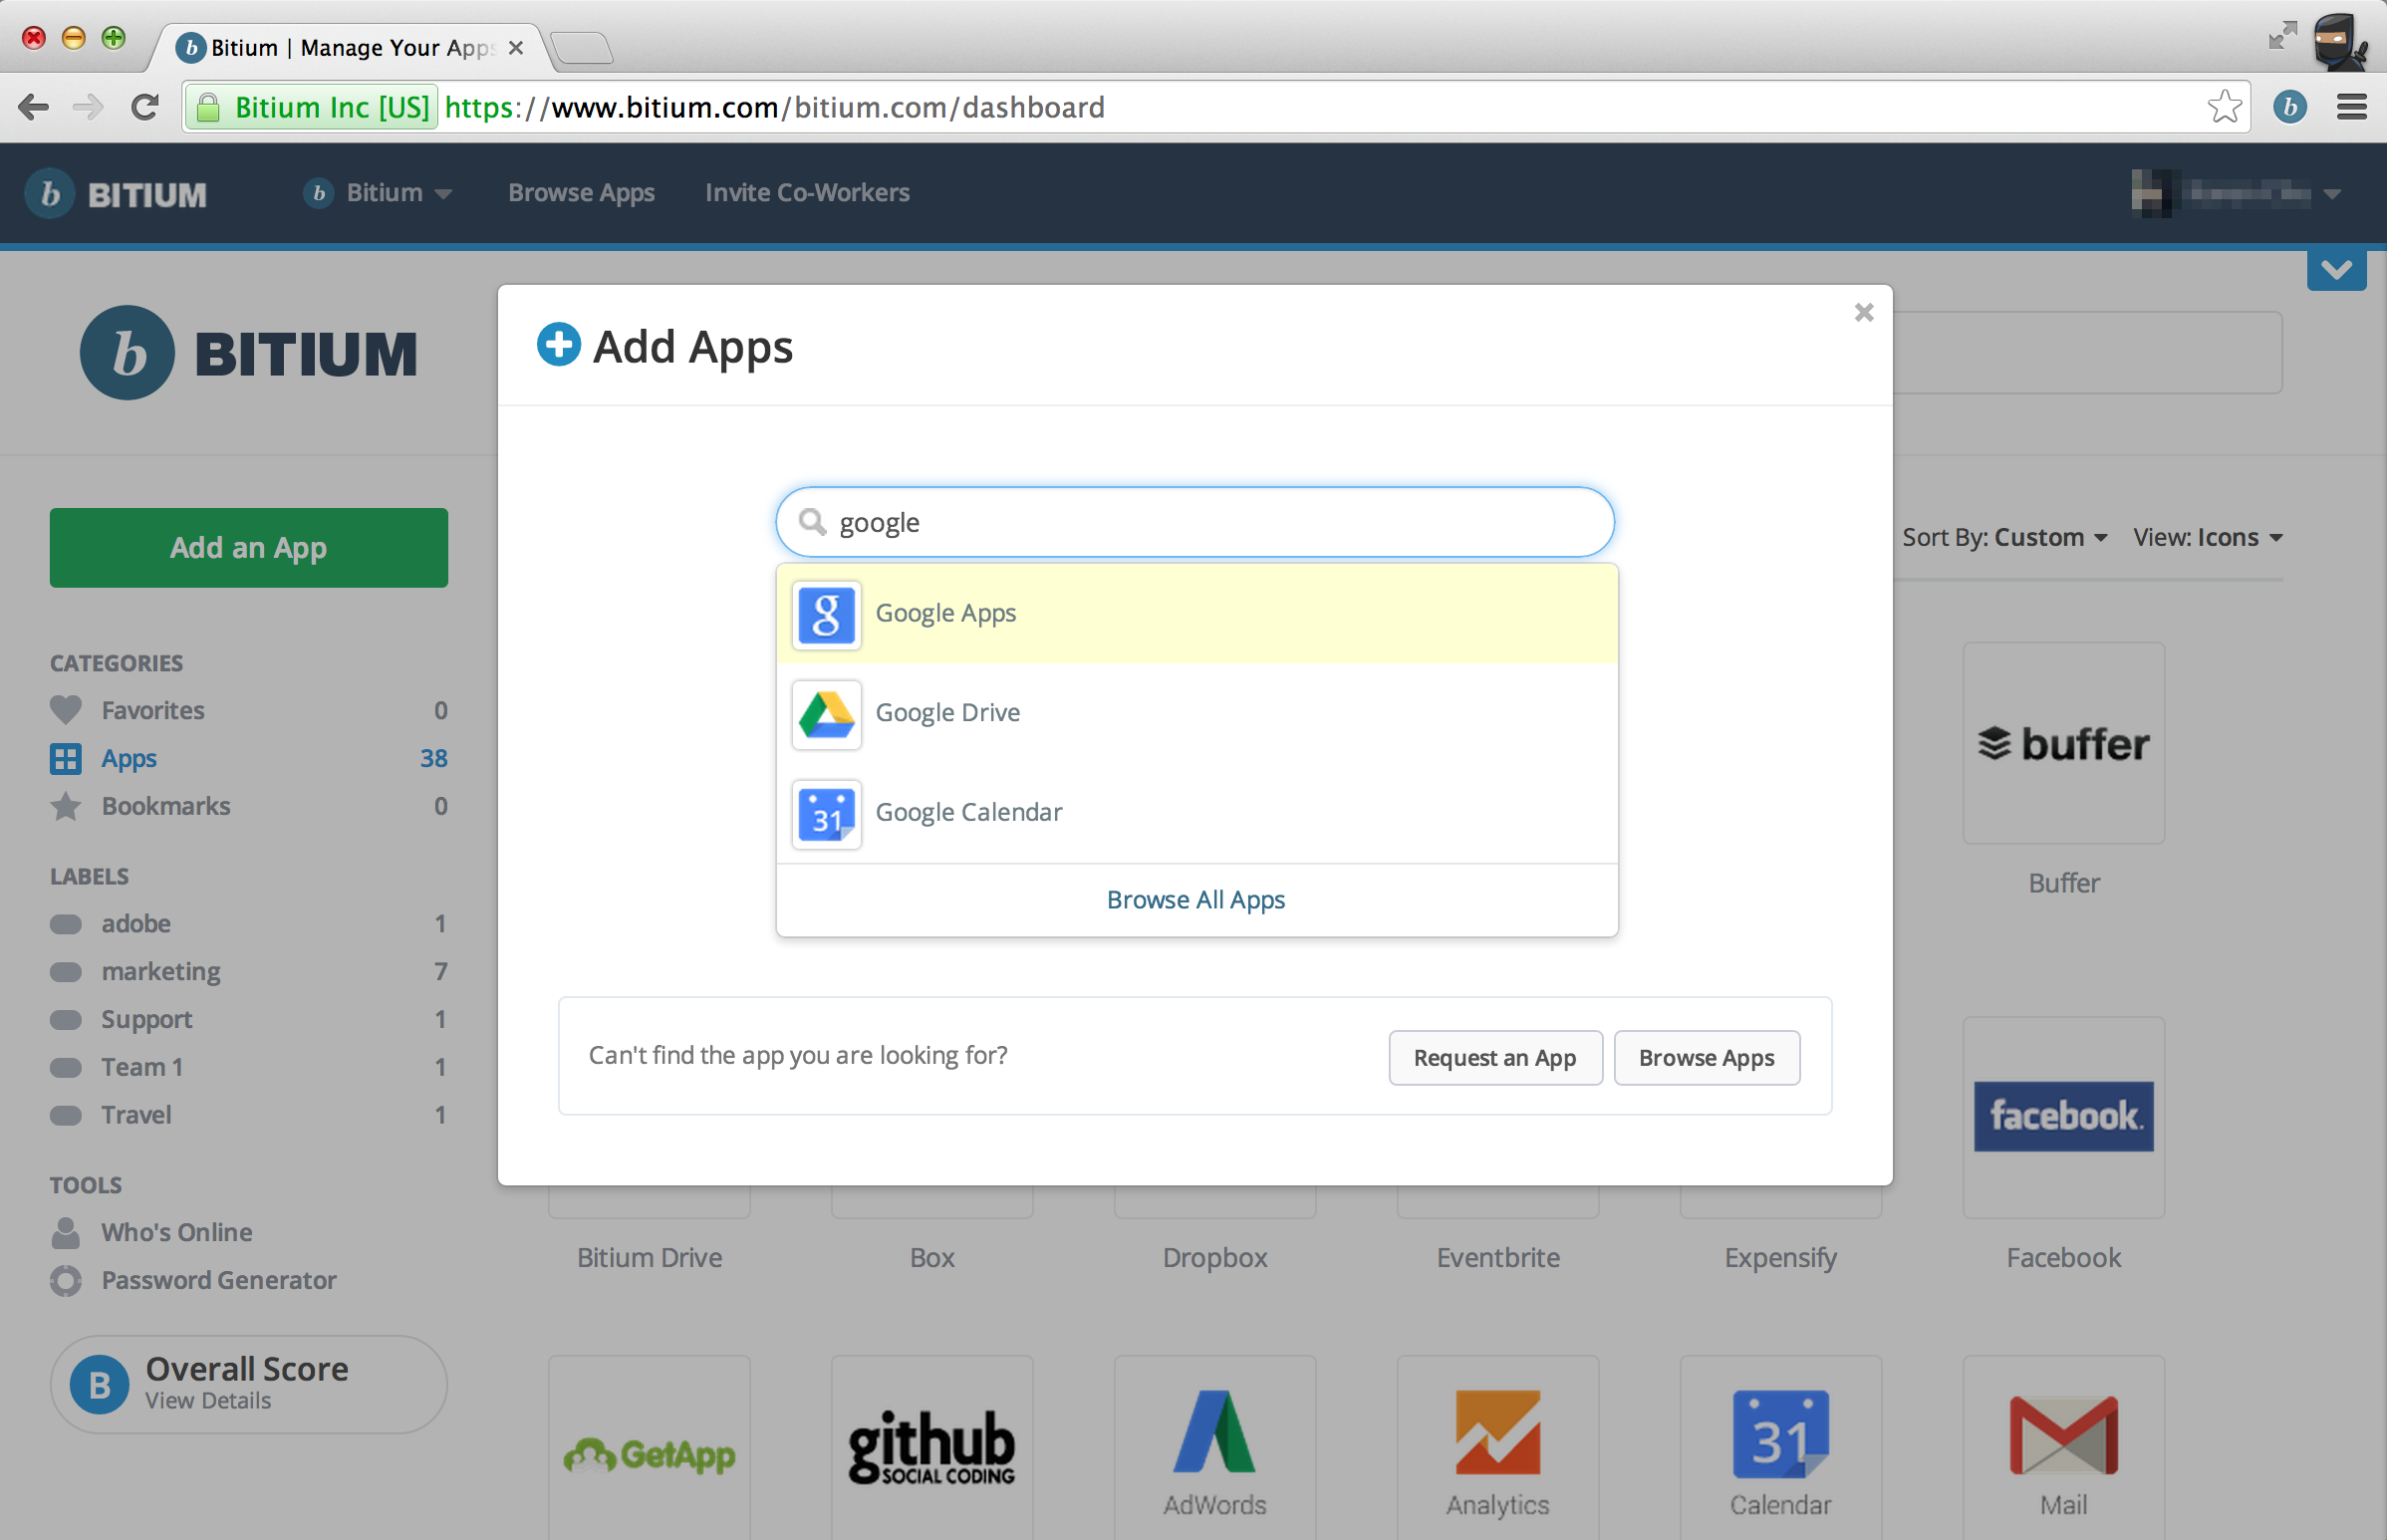 Bitium screenshot: Easily add an app to your Bitium Dashboard